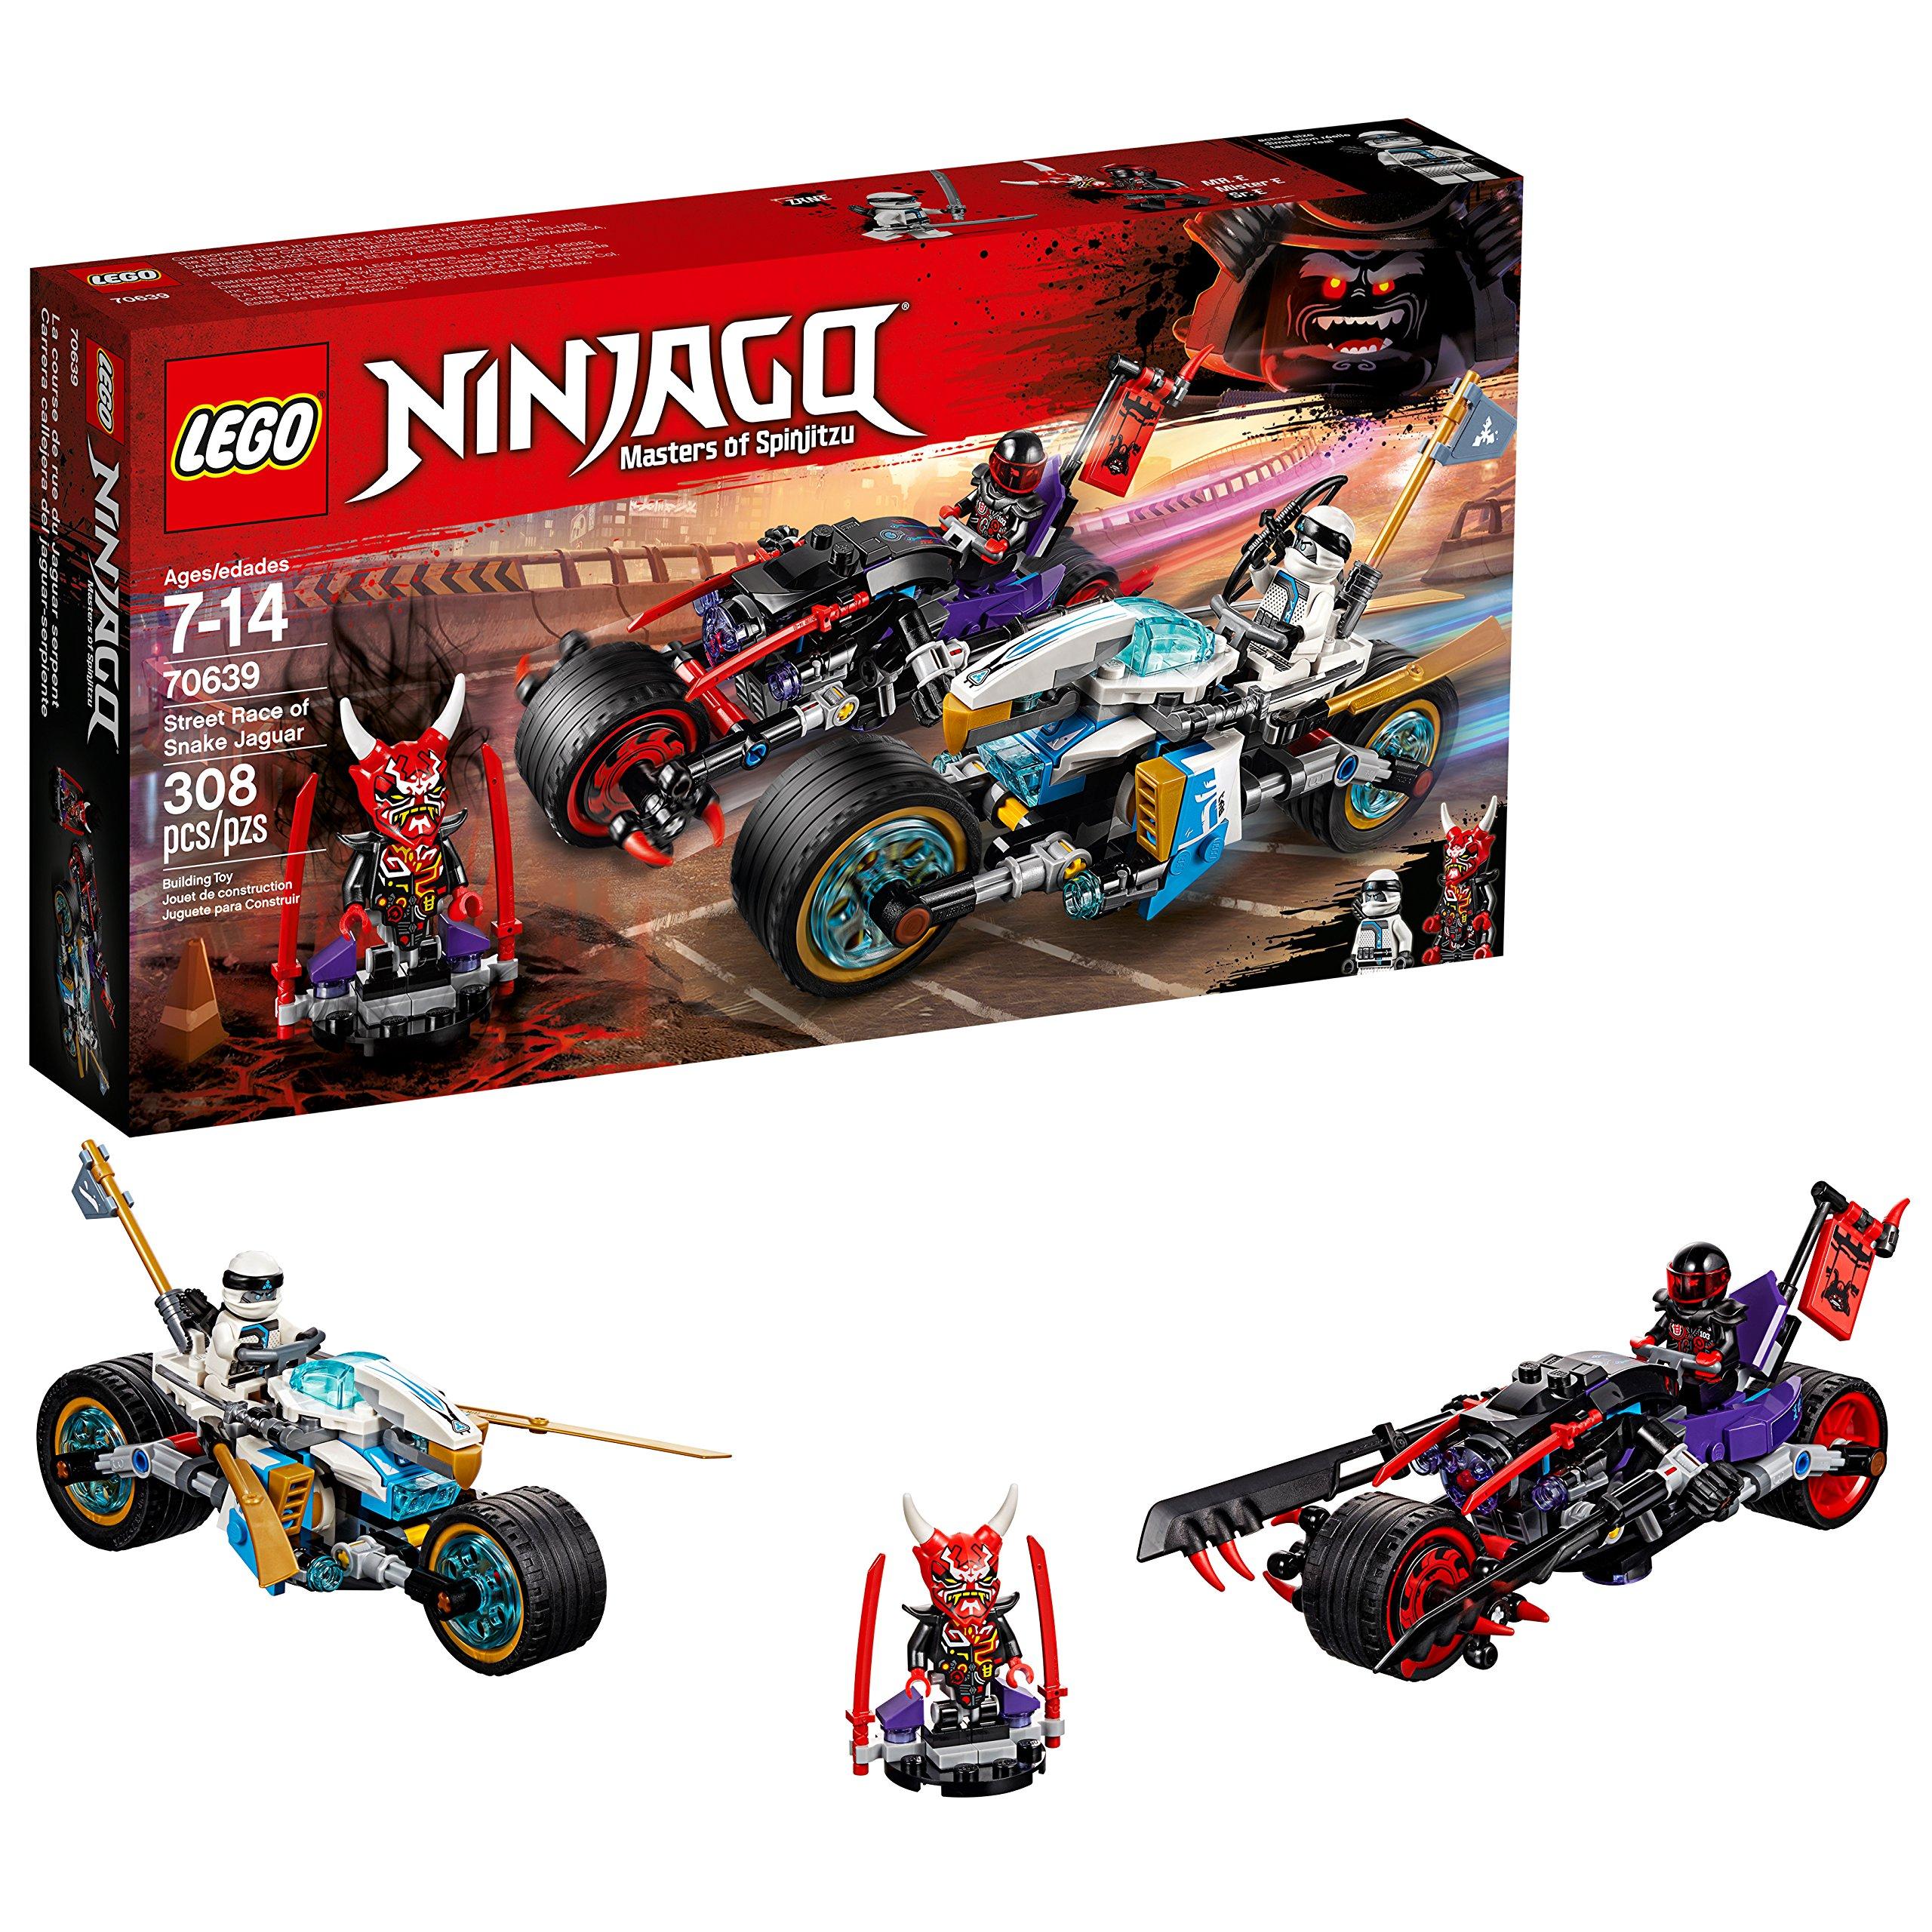 LEGO NINJAGO Street Race of Snake Jaguar 70639 Building Kit (308 Pieces) (Discontinued by Manufacturer)